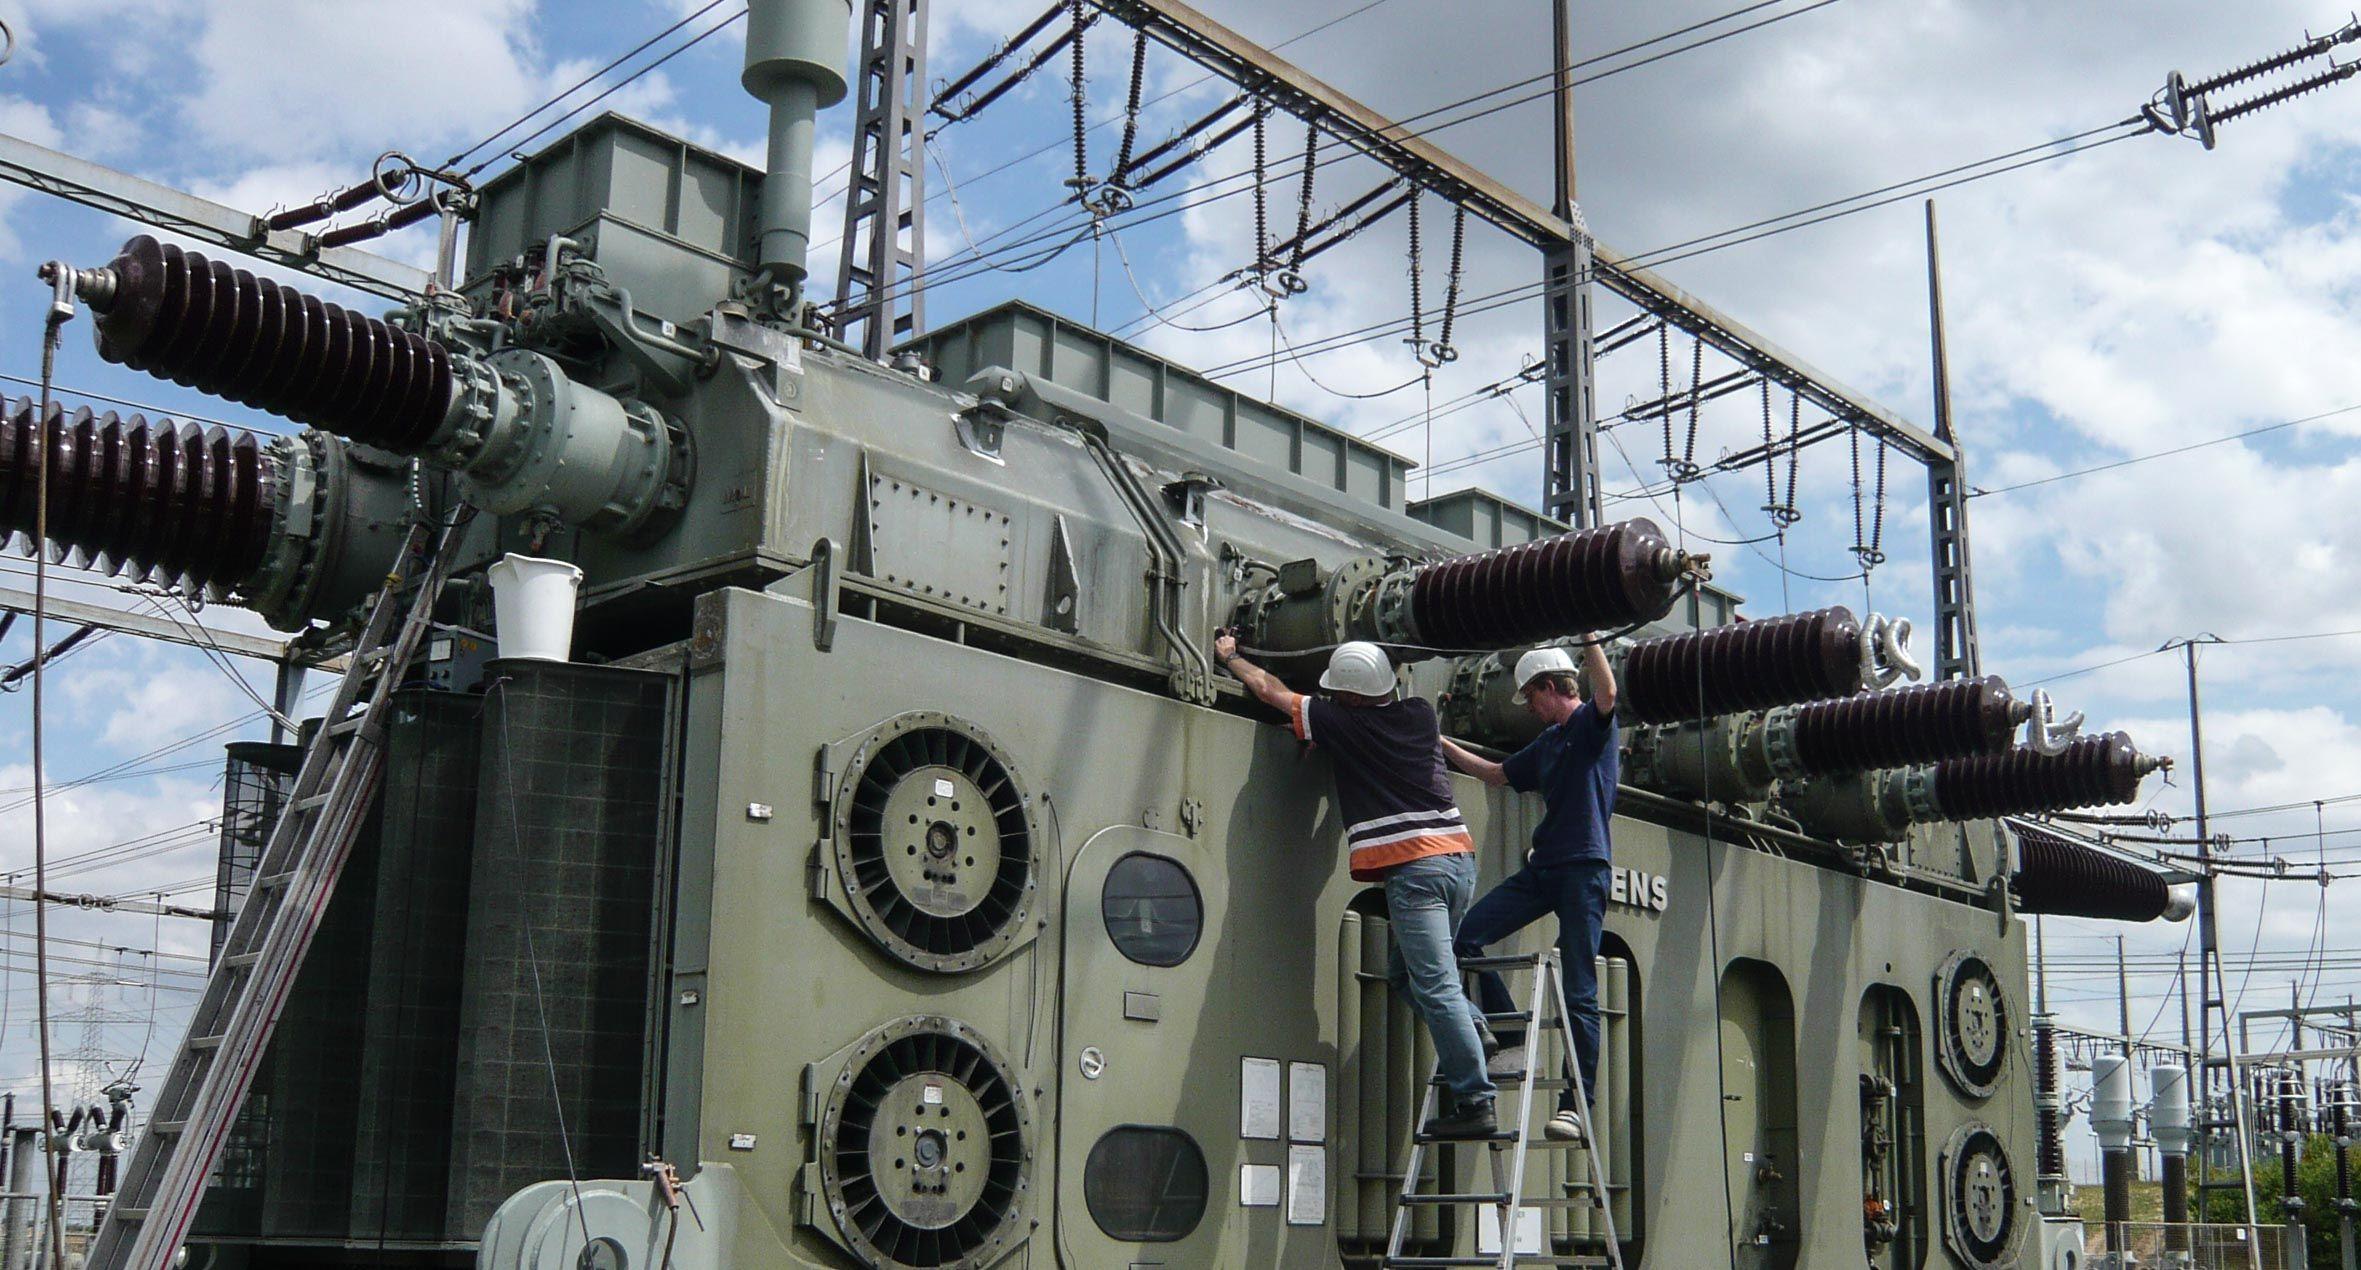 Field measurement at a transformer